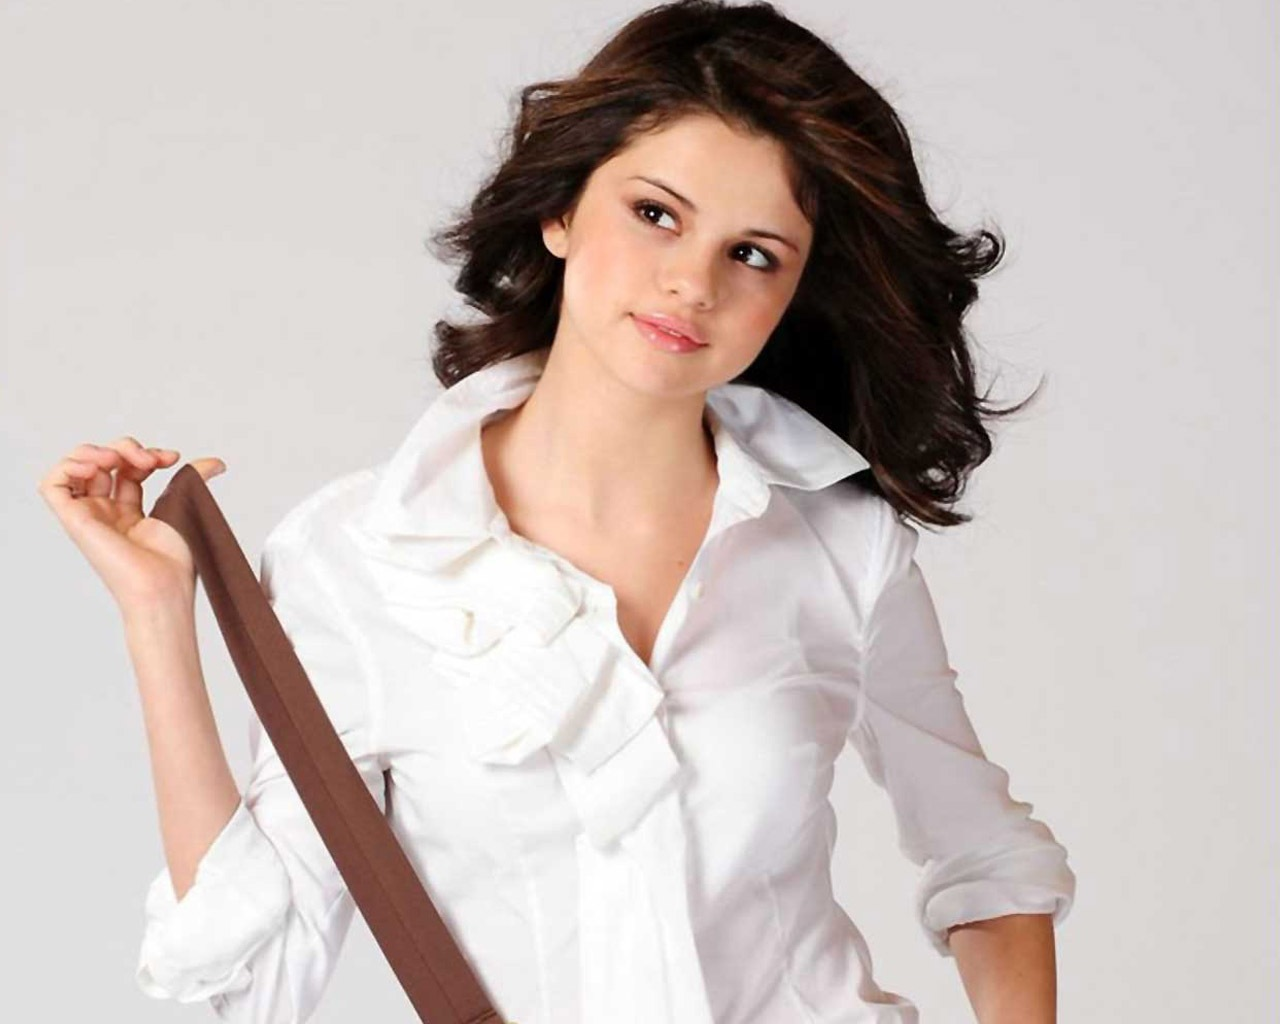 Selena Gomez HD Wallpapers 2012 2013 1280x1024